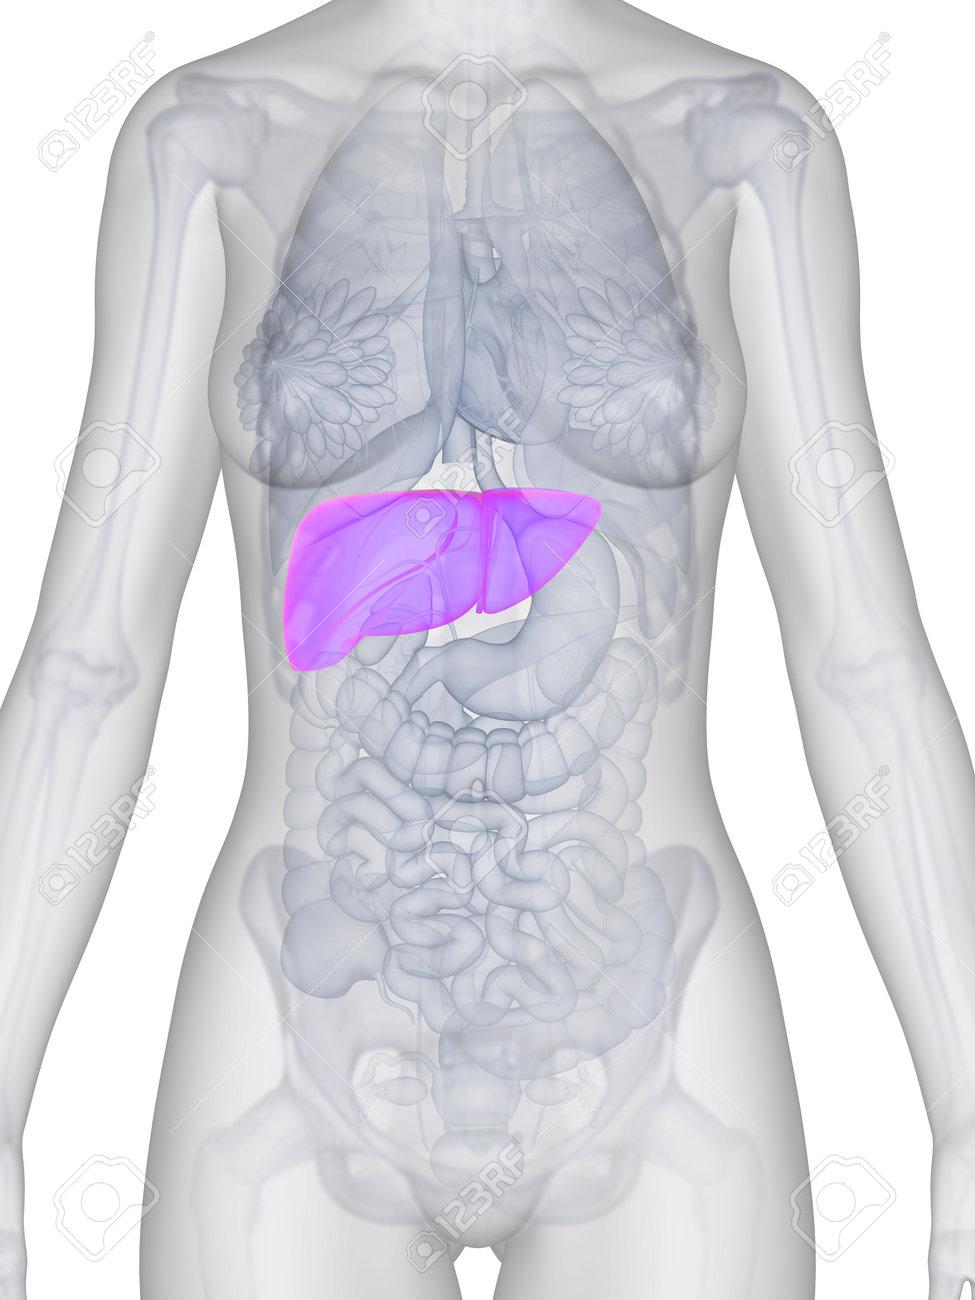 3d rendered illustration of the female anatomy - liver Stock Illustration - 19040134